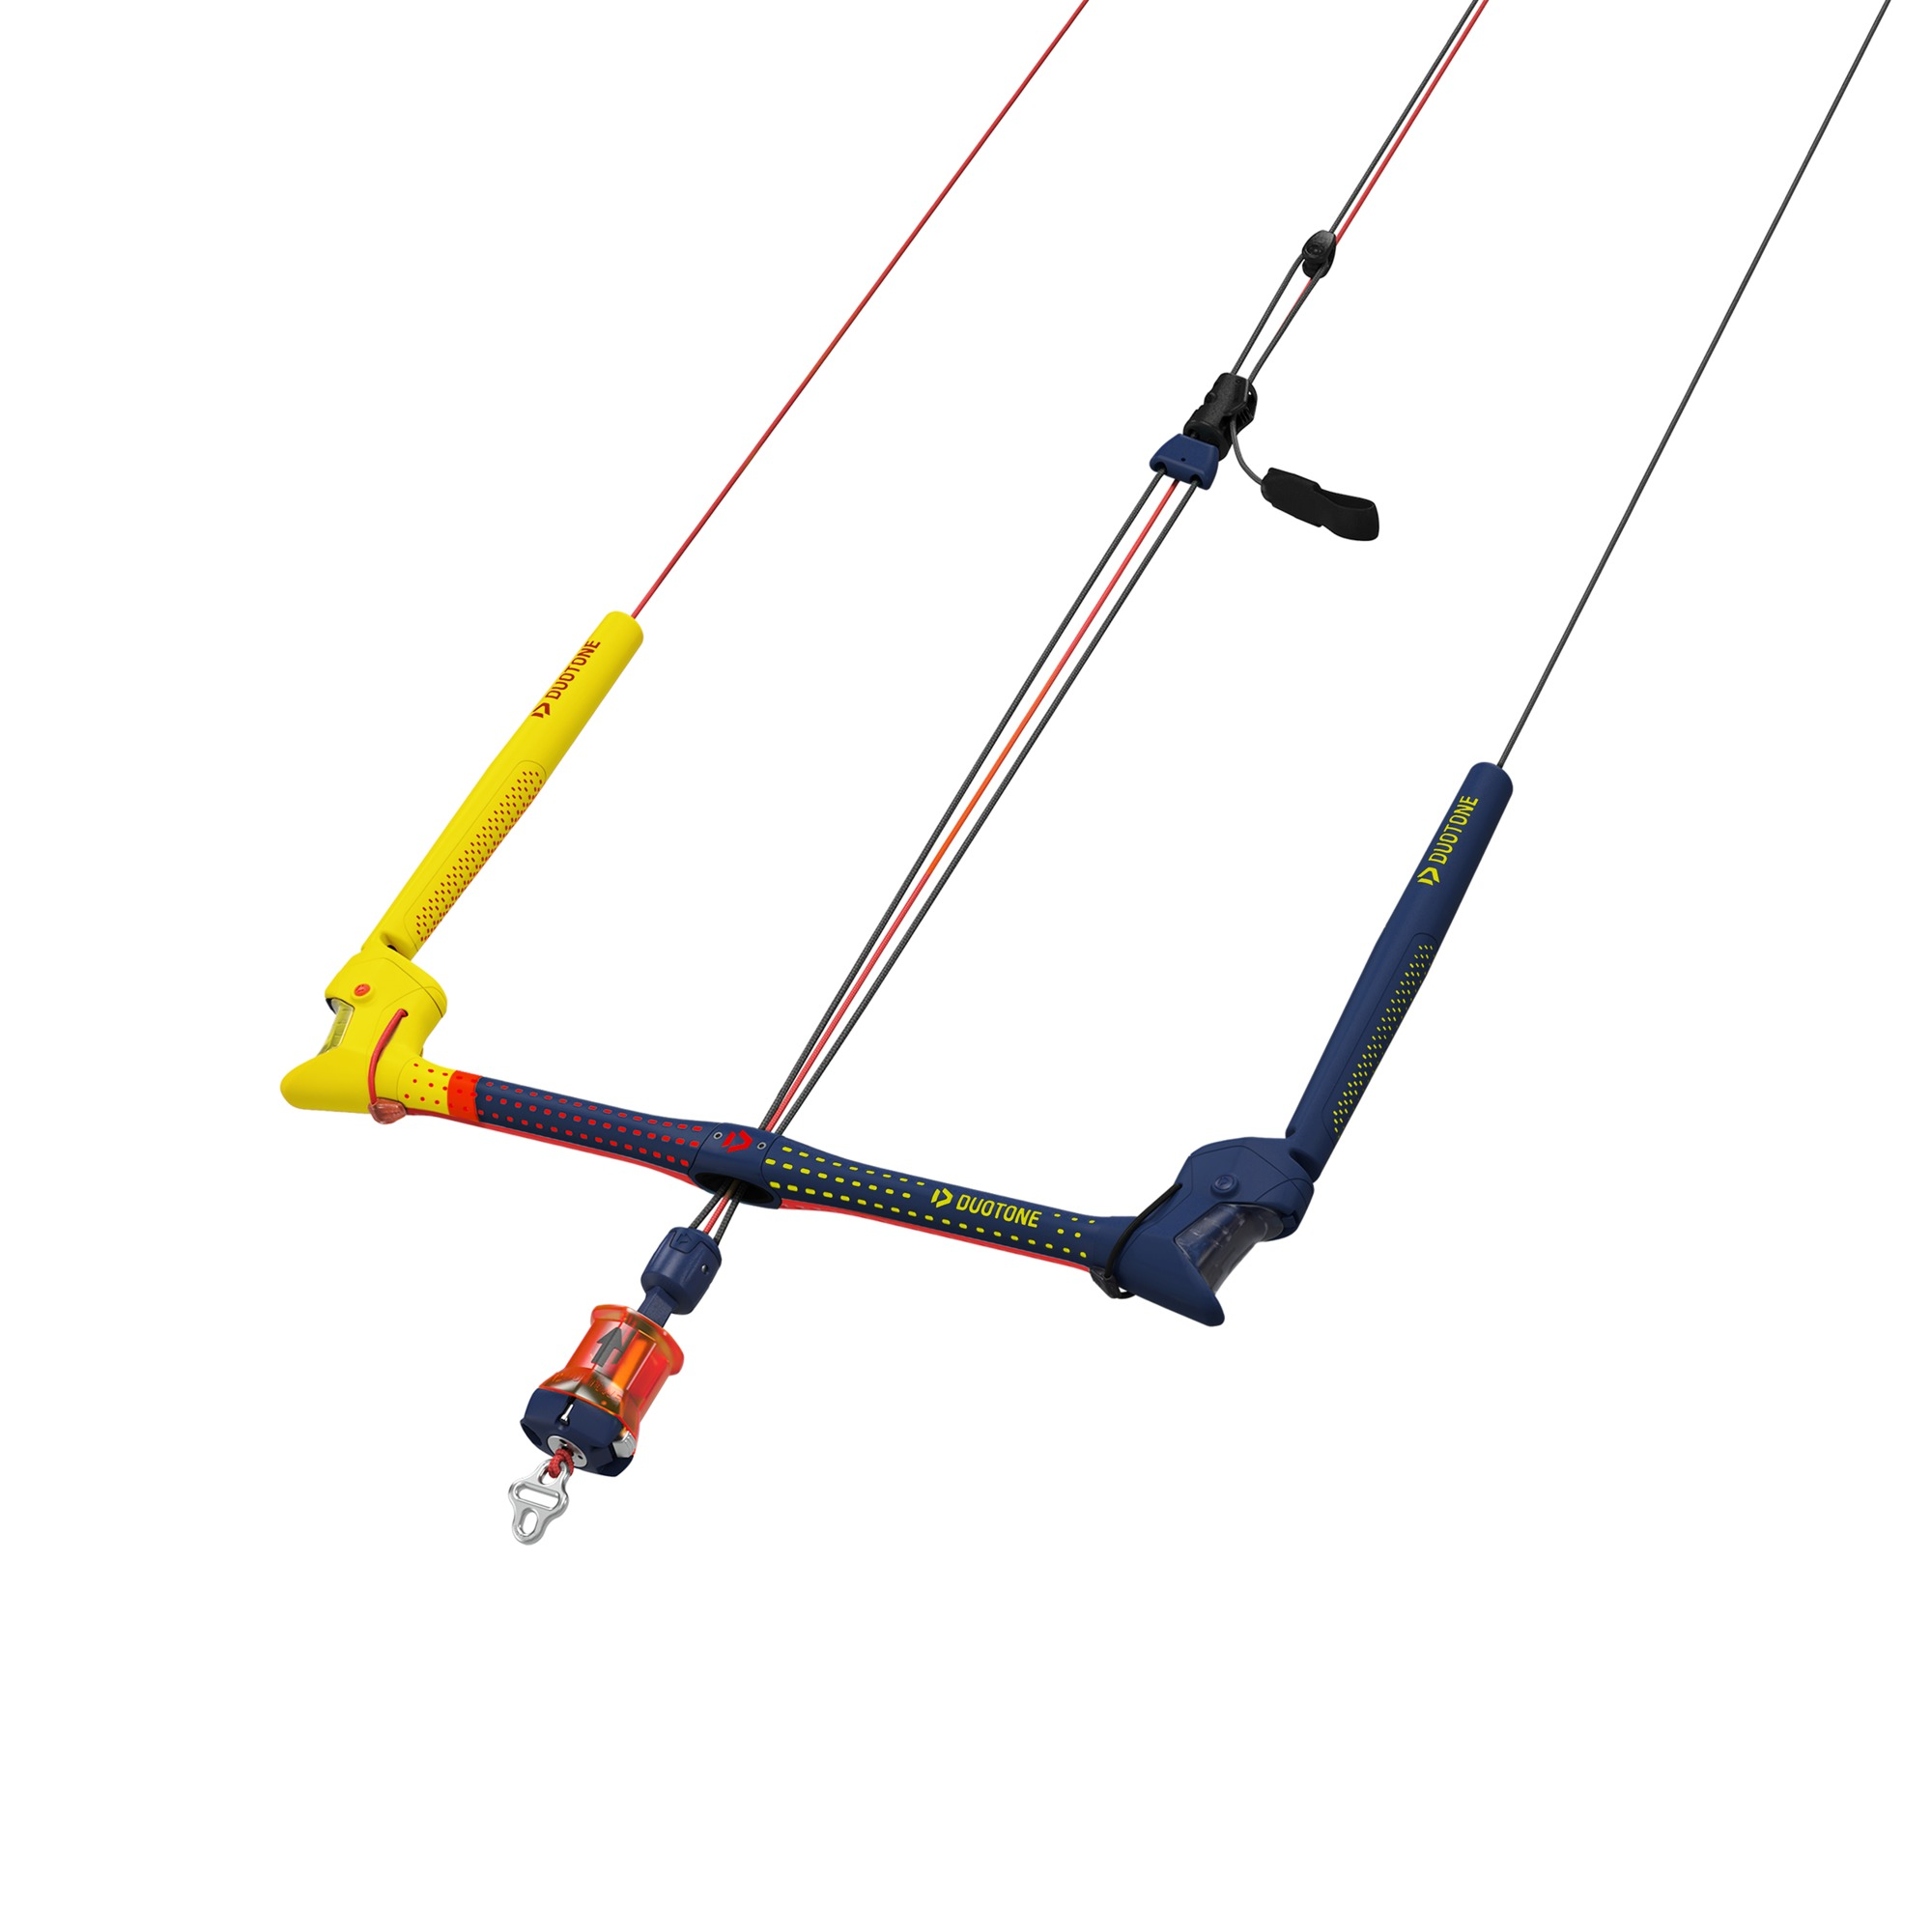 Duotone Kiteboarding Trust Bar 2020 kitesurfing equipment